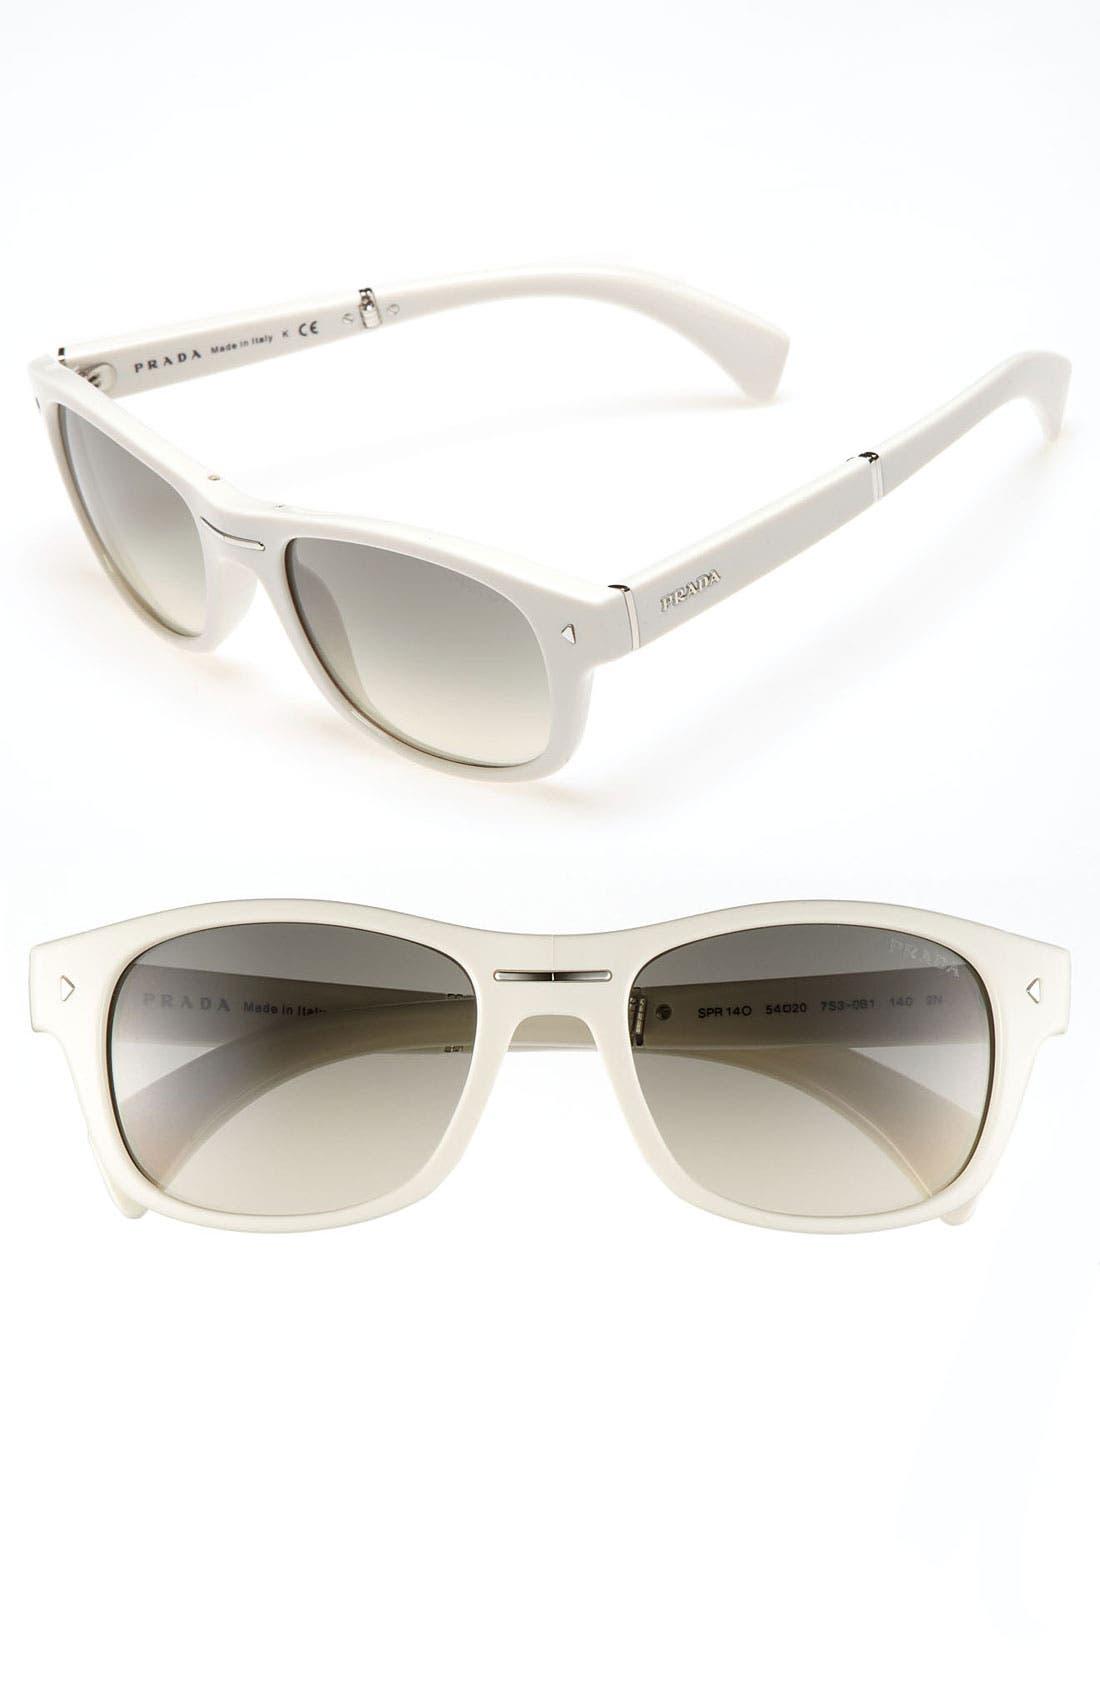 Alternate Image 1 Selected - Prada 54mm Retro Inspired Sunglasses